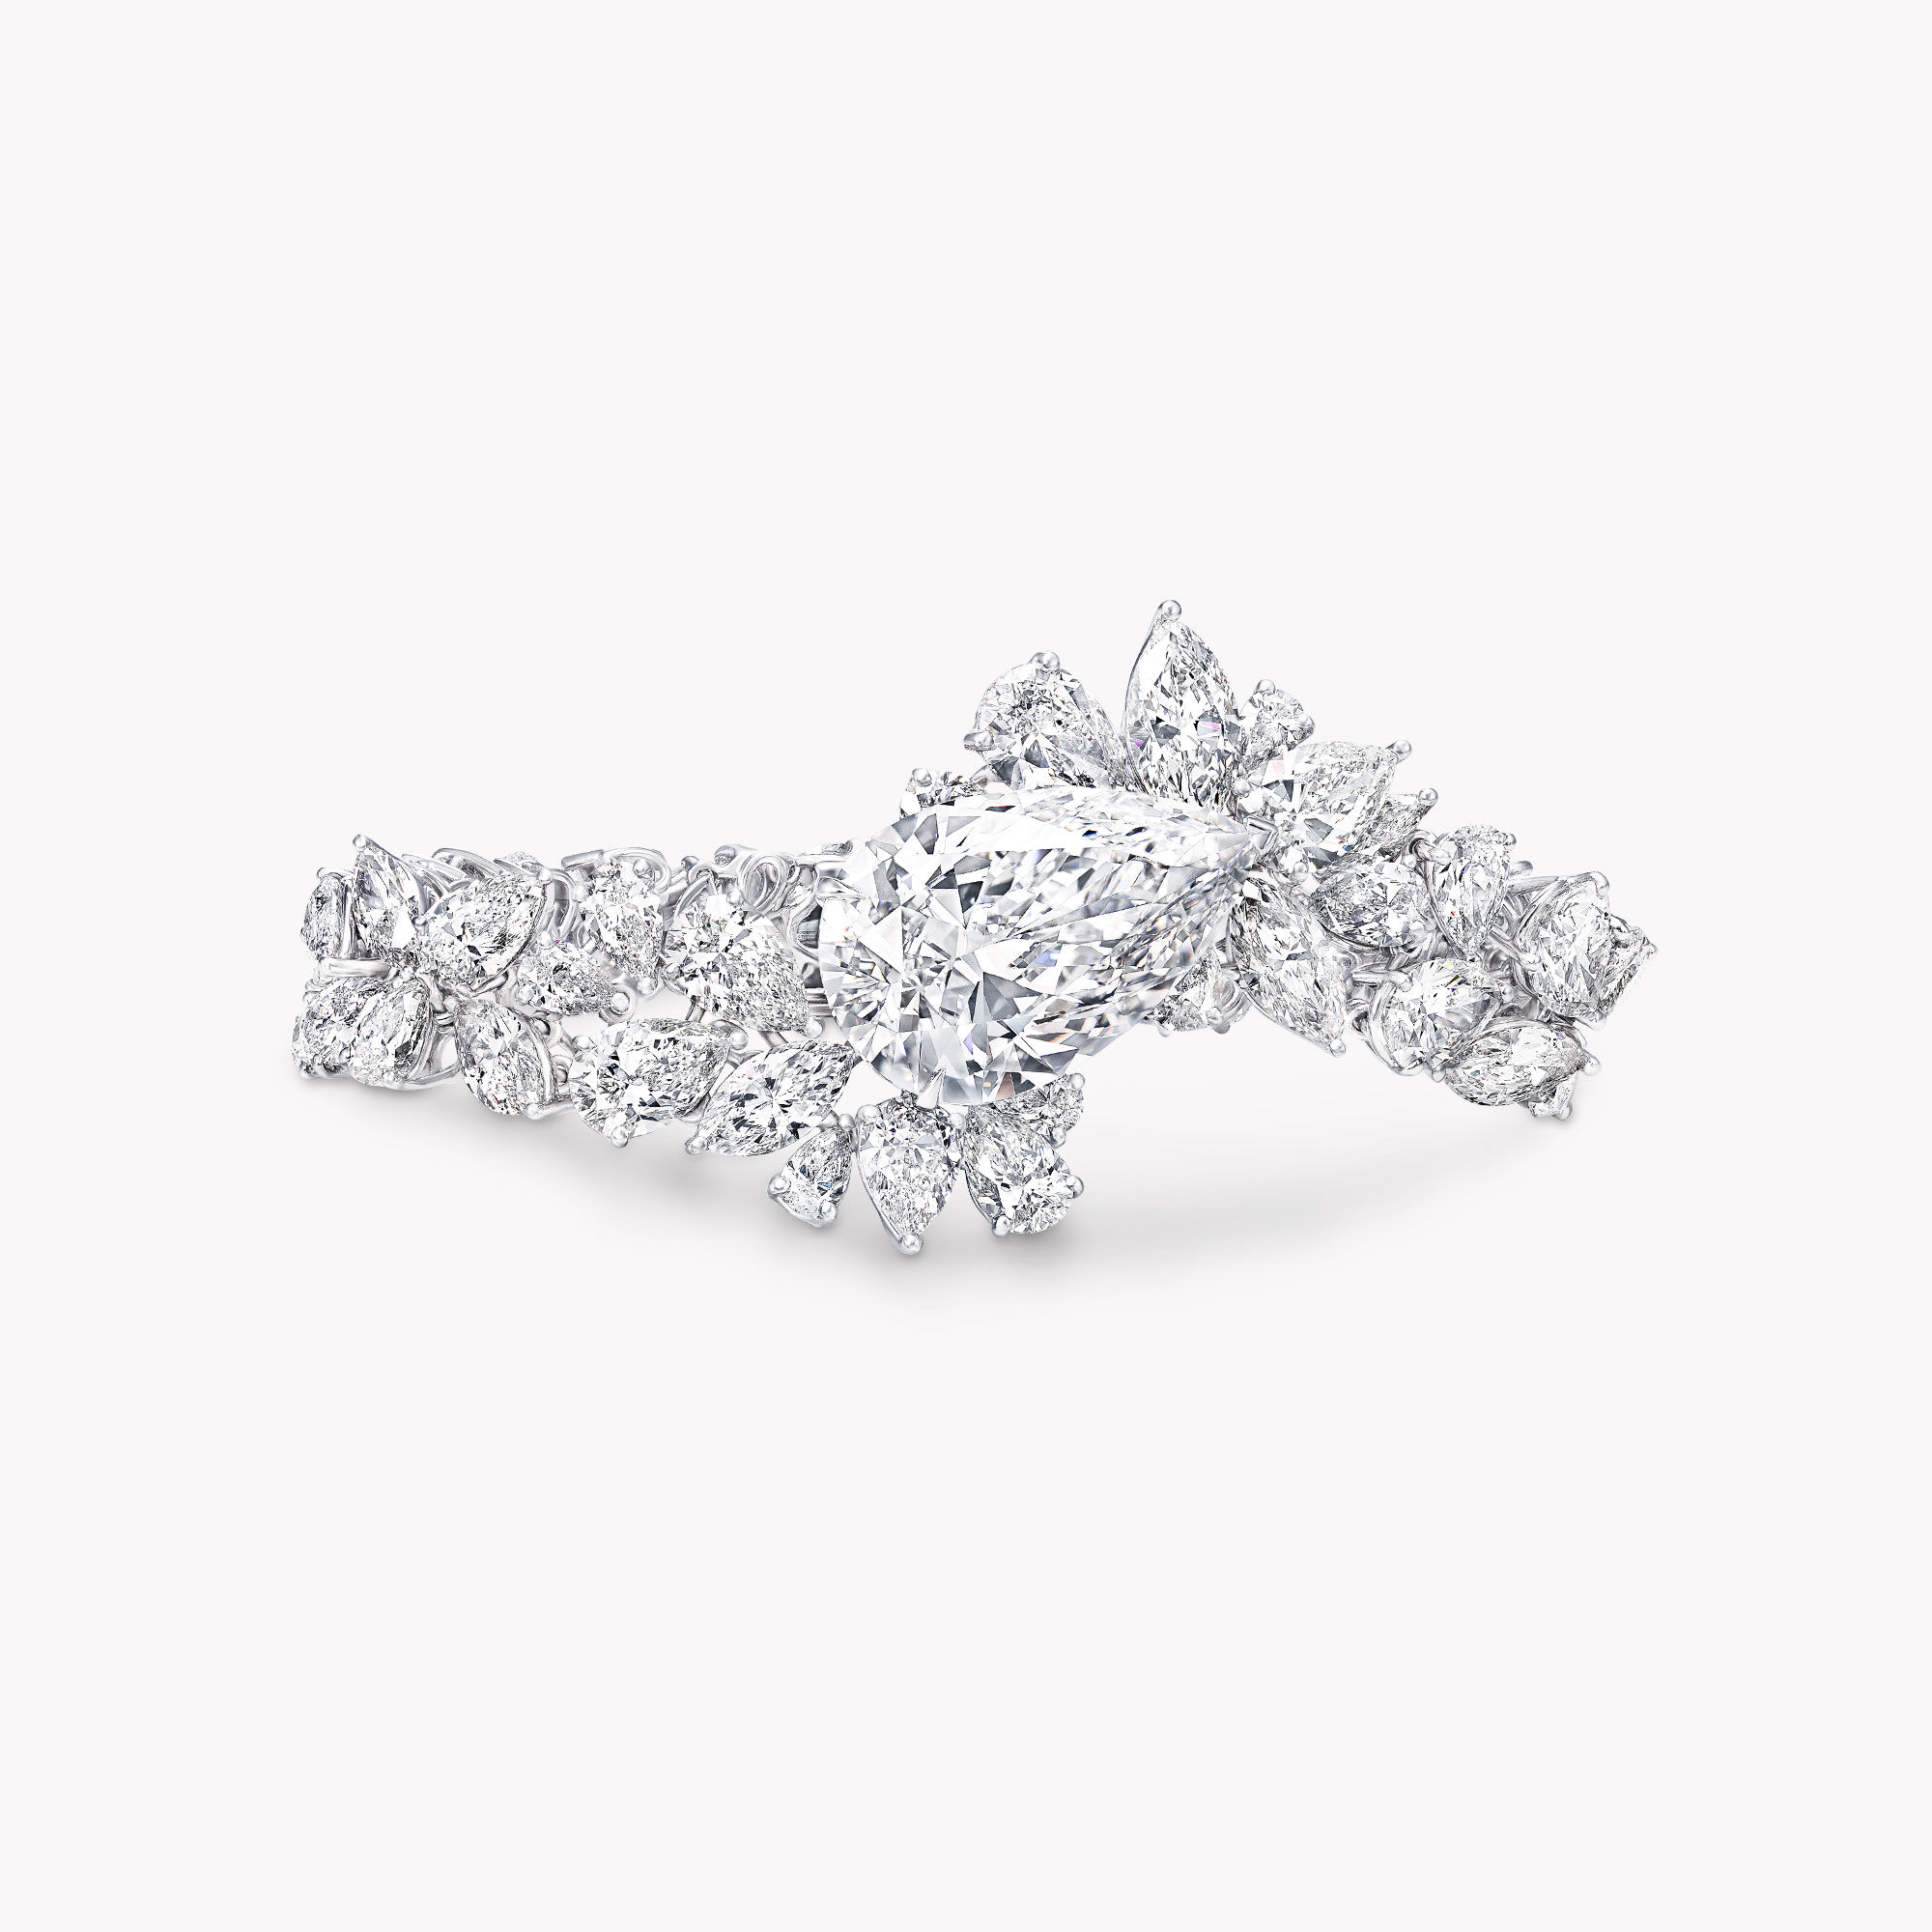 A Graff white diamond high jewellery bracelet featuring a pear shape diamond